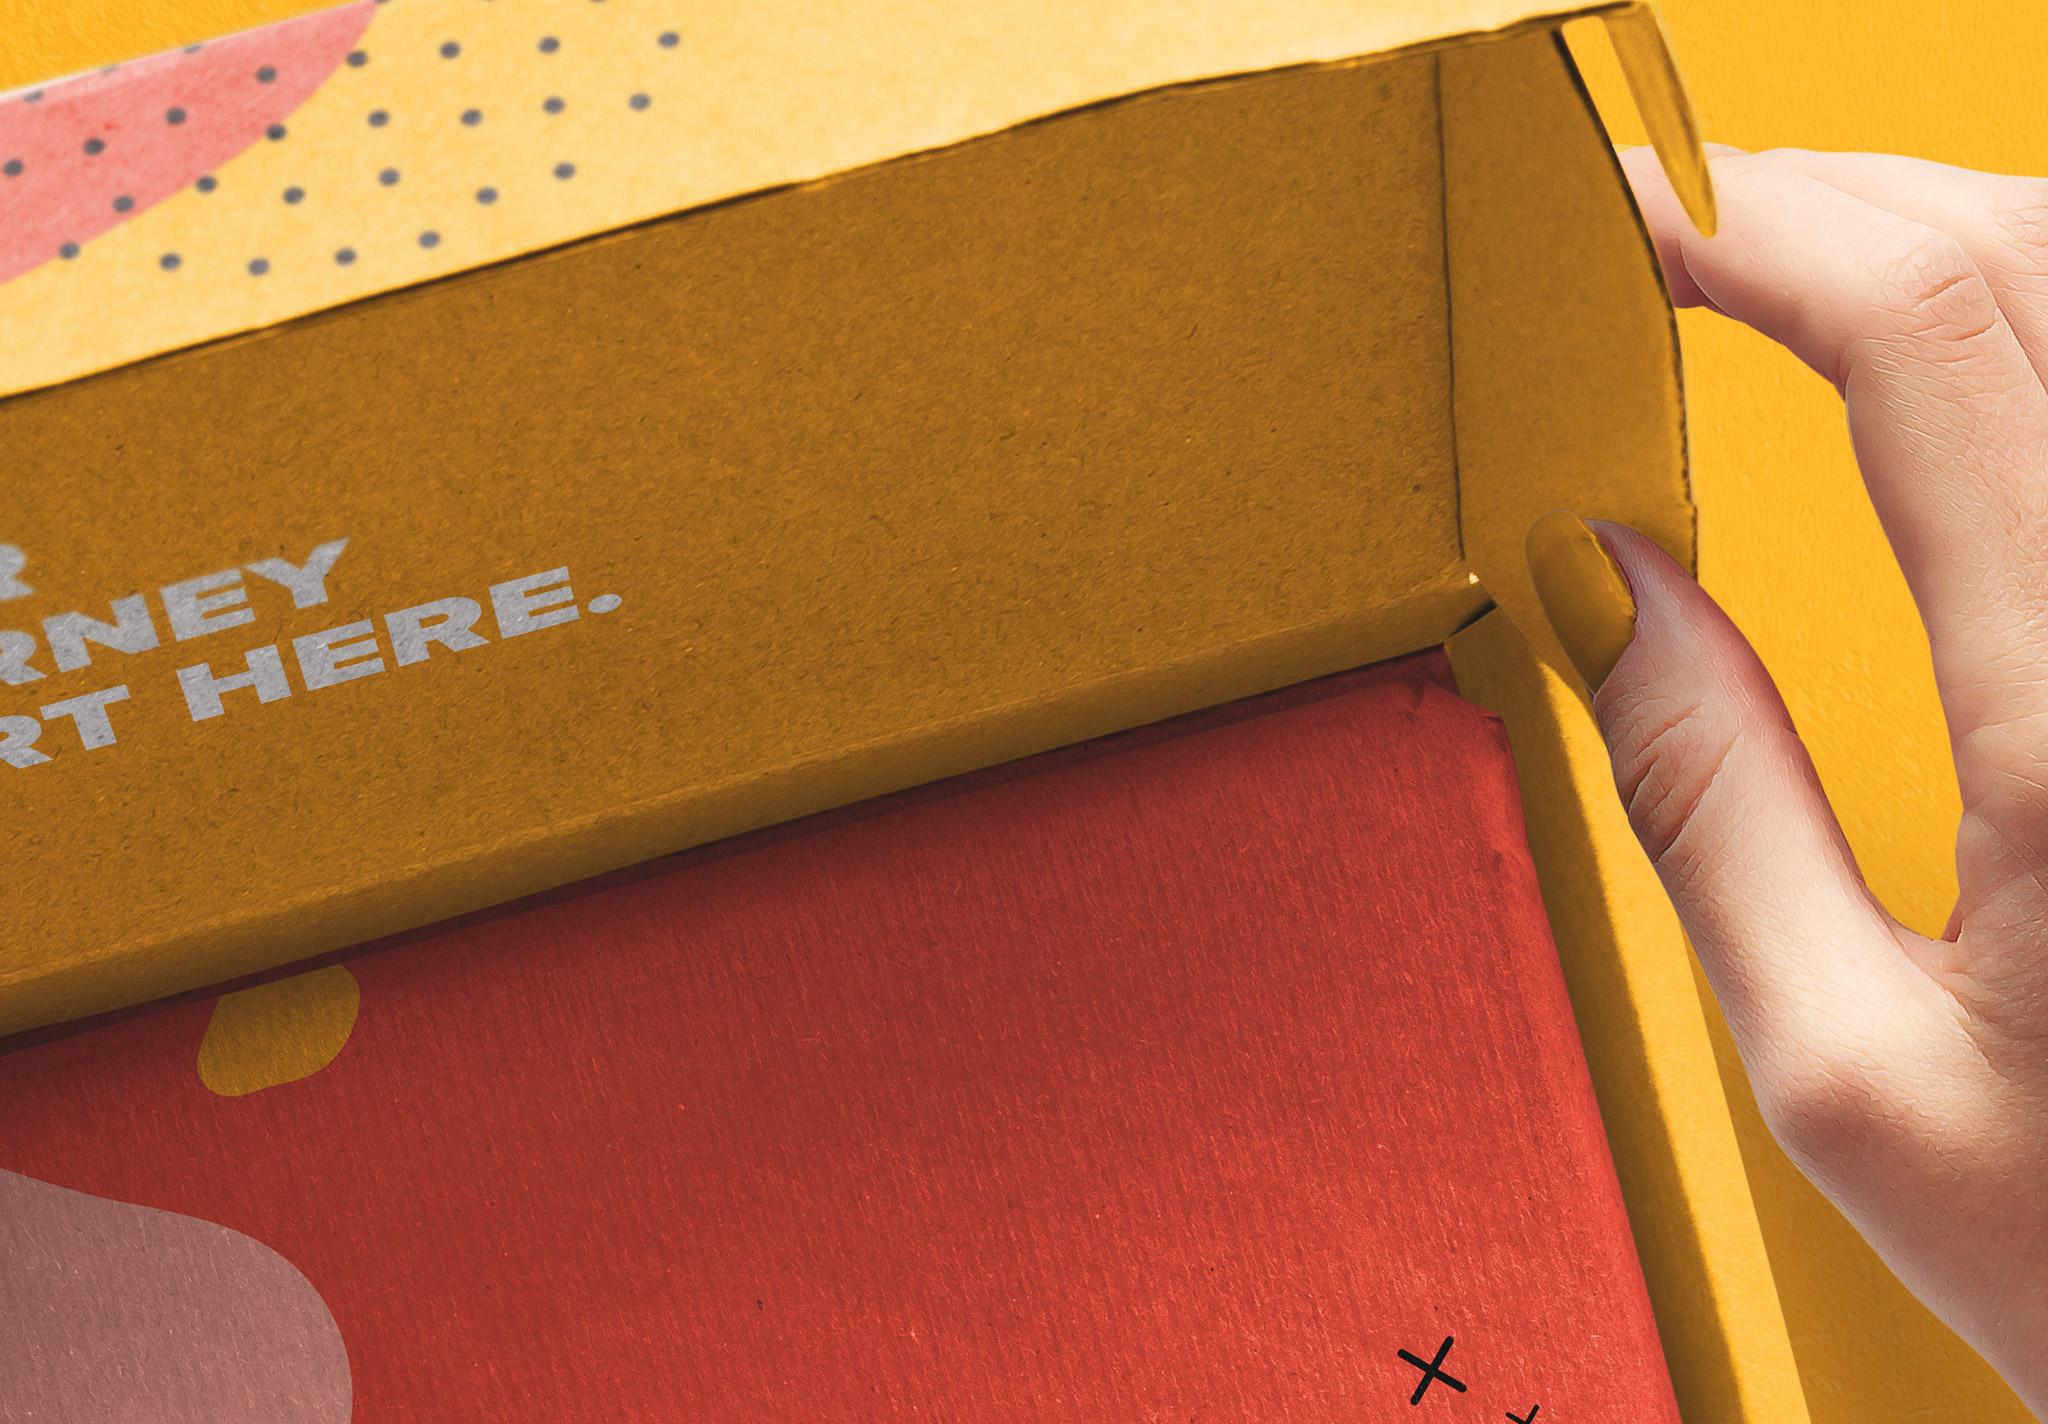 Hand Holding Opened Postal Box Lid Mockup image04